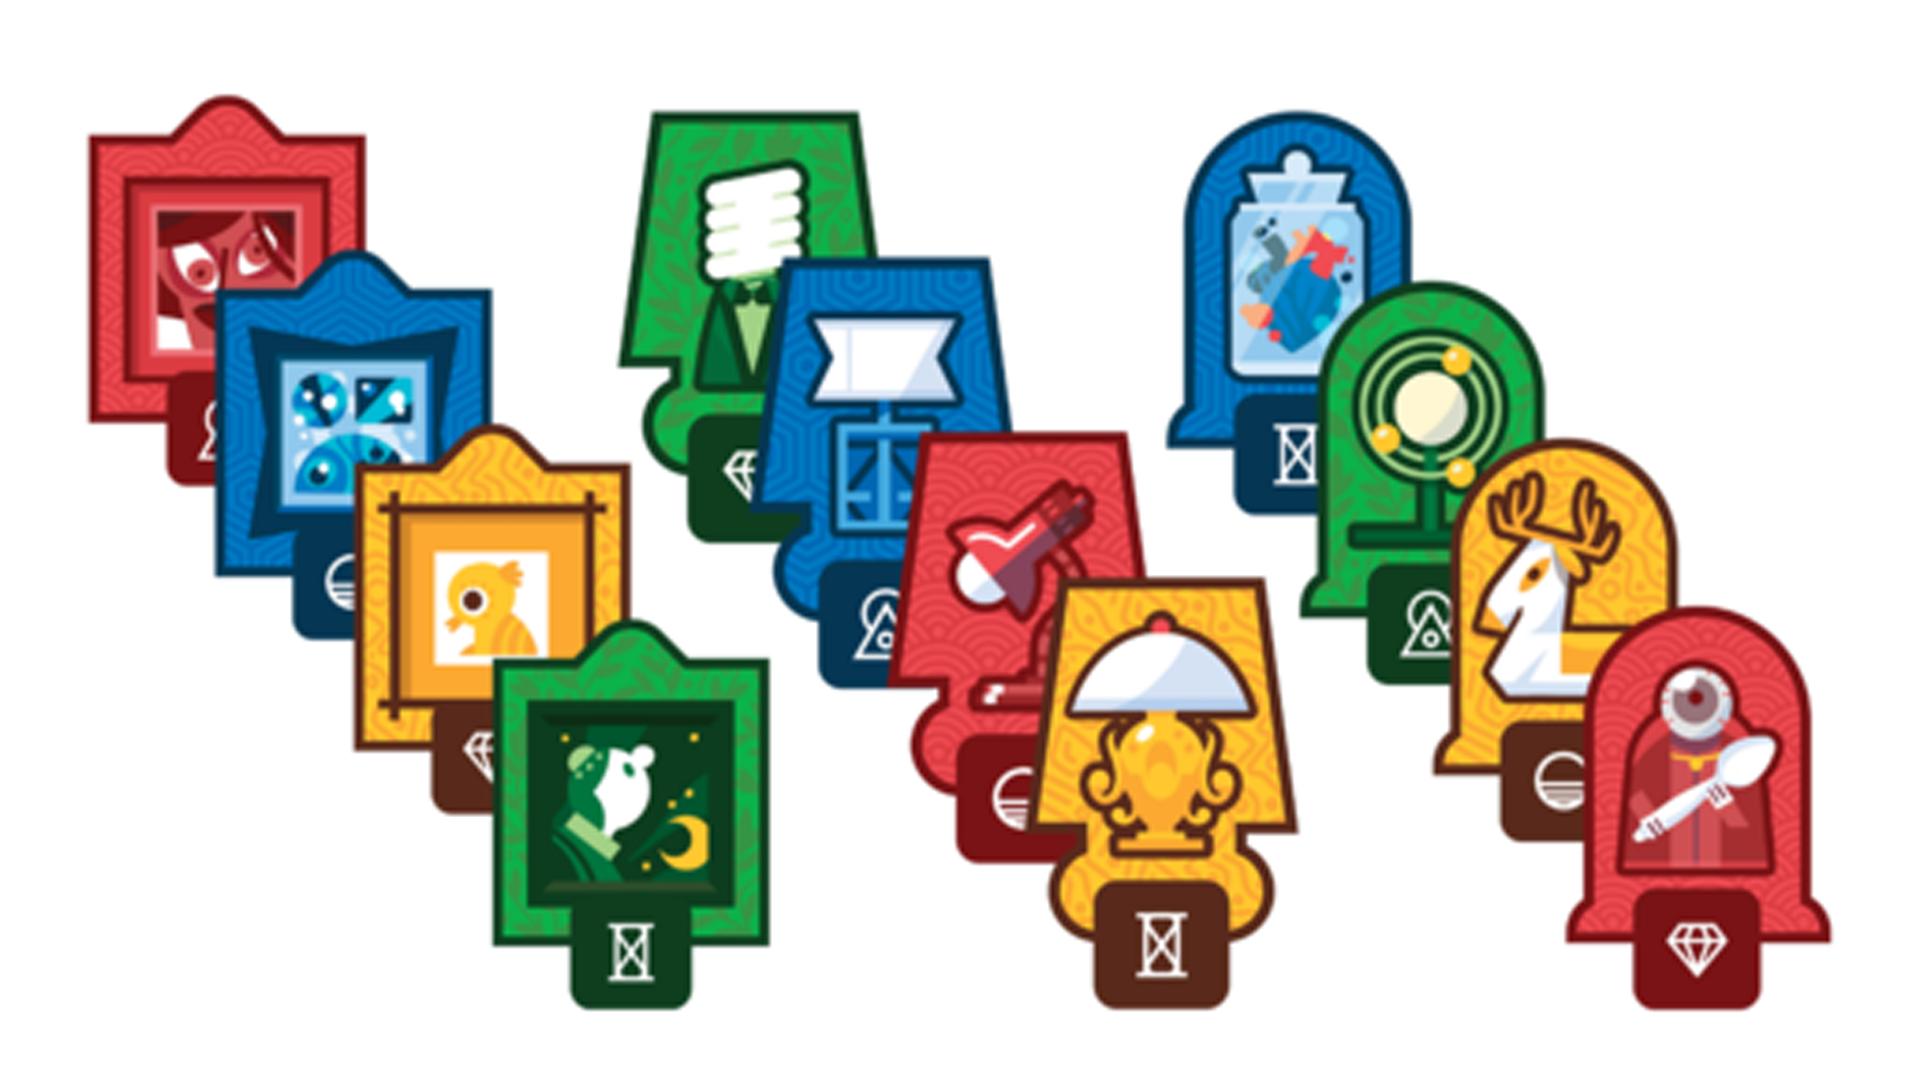 Decoram board game pieces